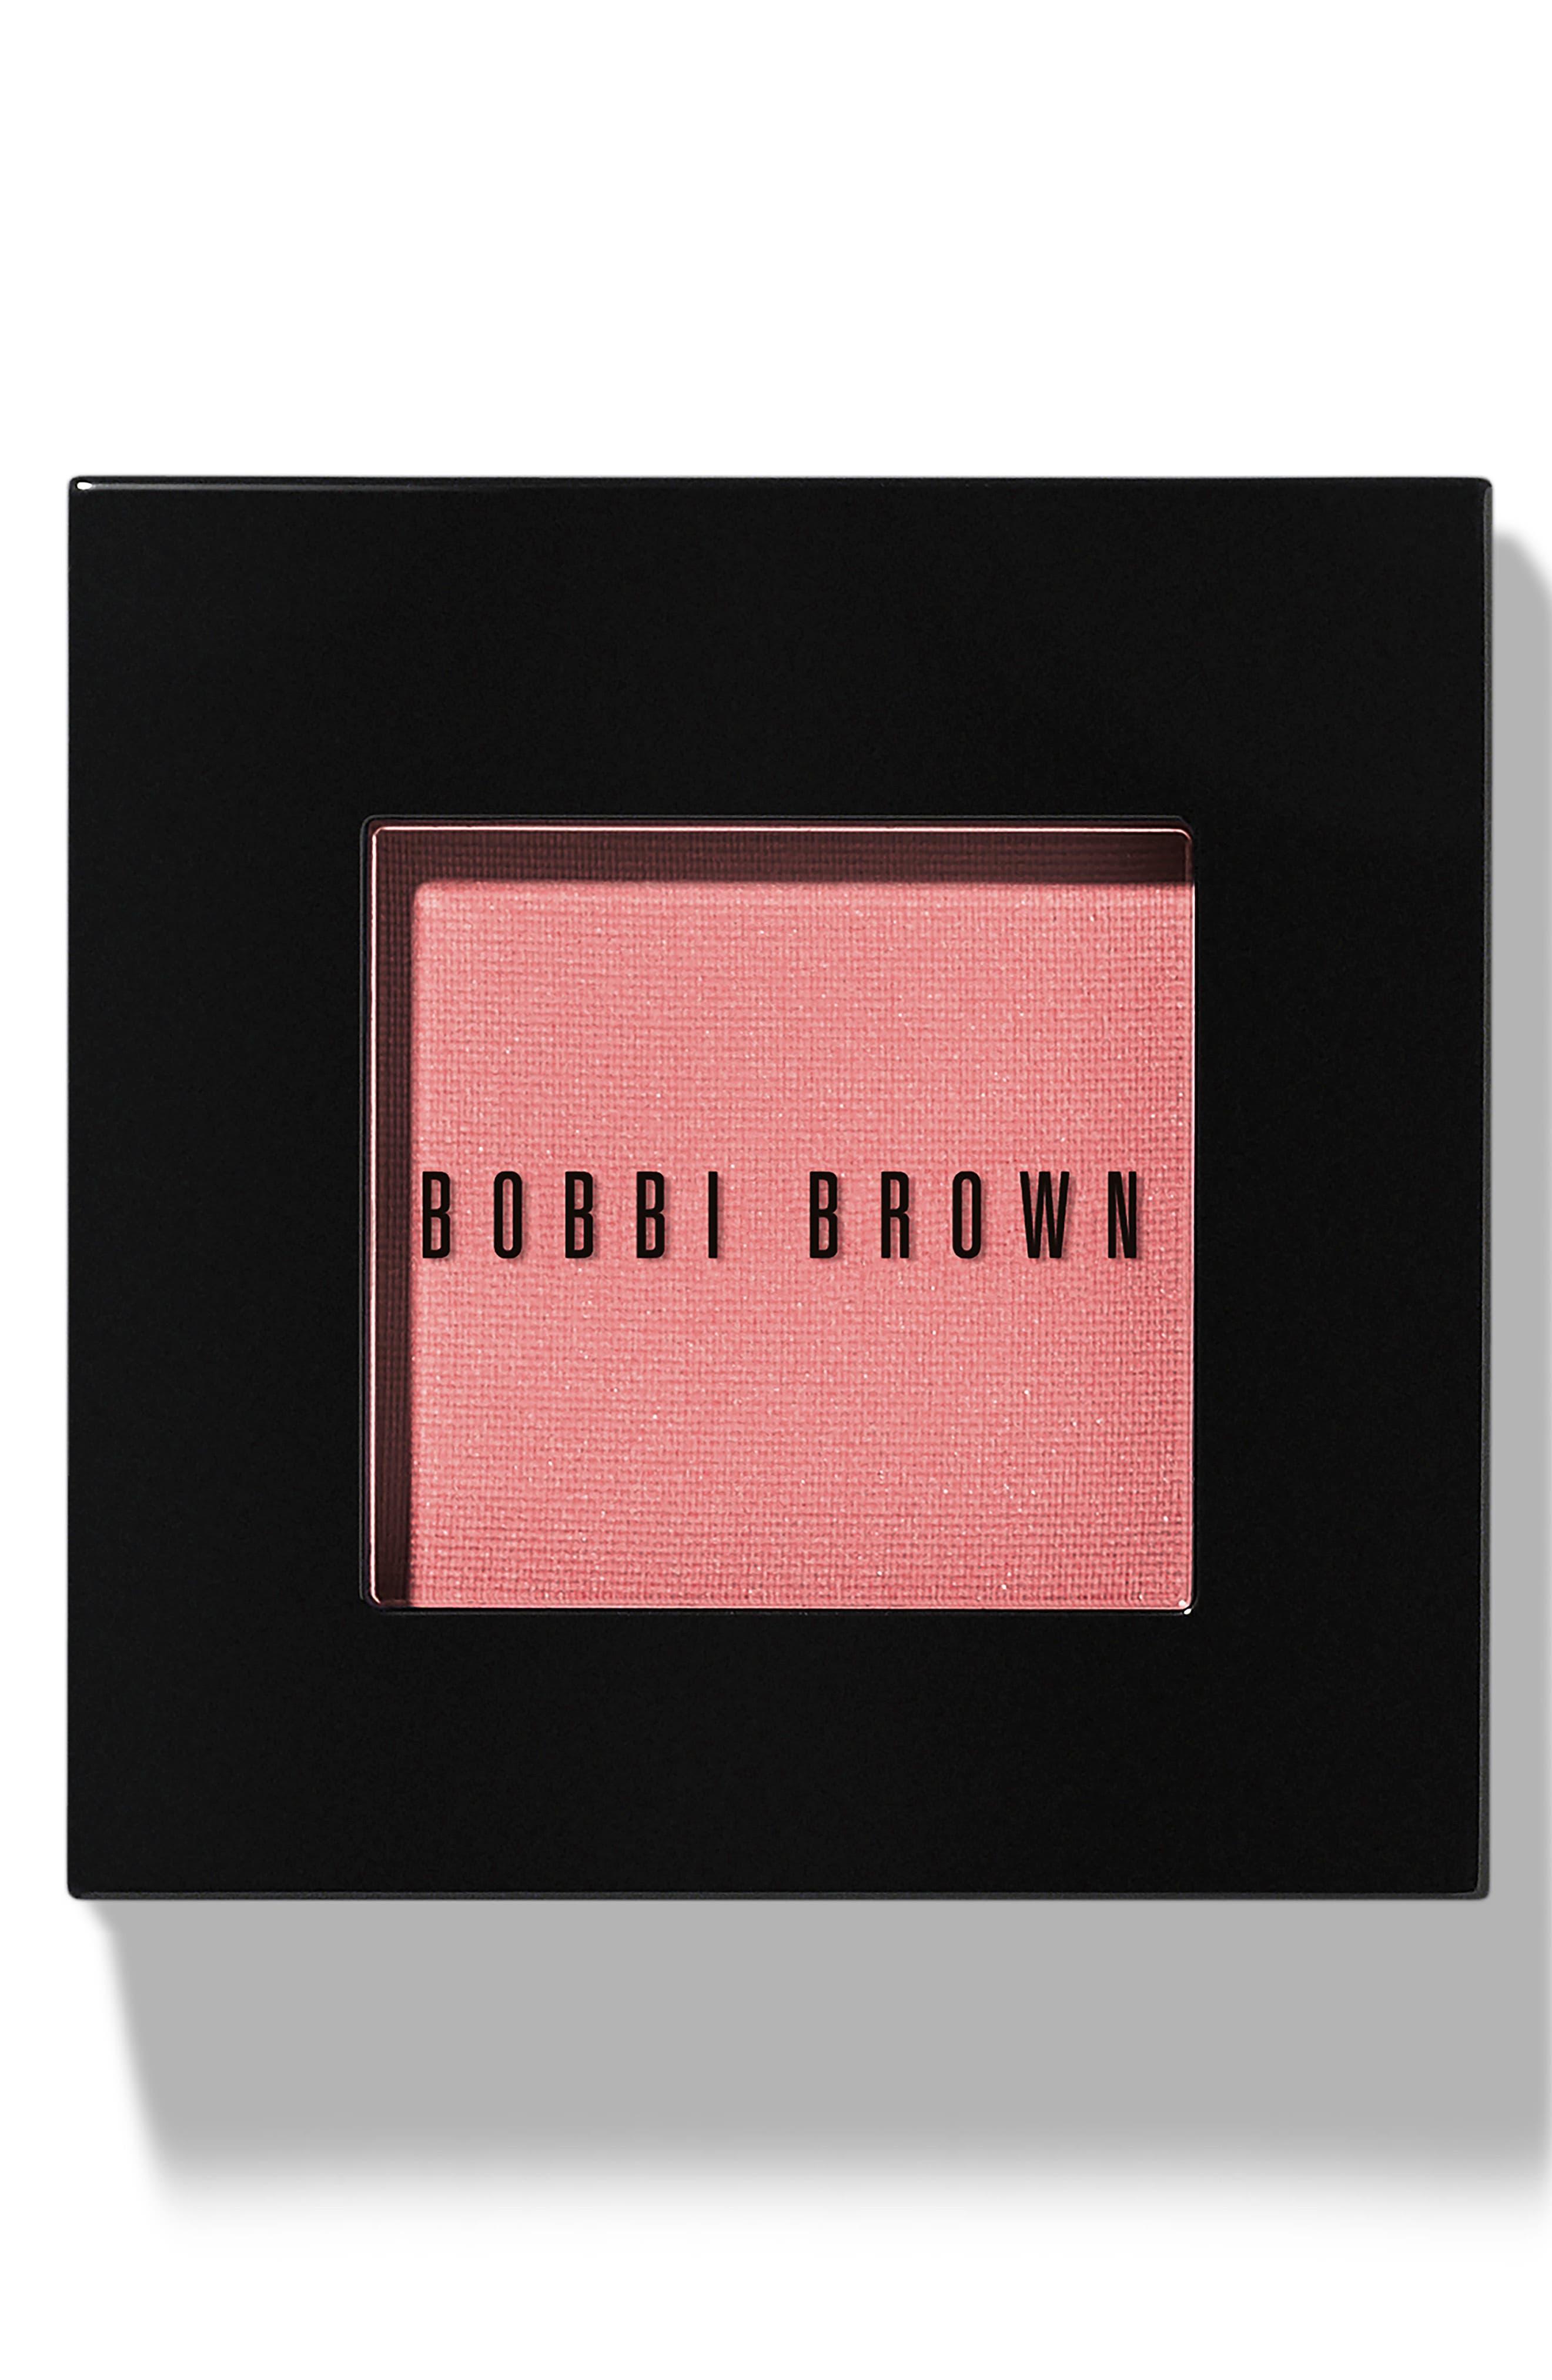 BOBBI BROWN, Blush, Main thumbnail 1, color, ROSE